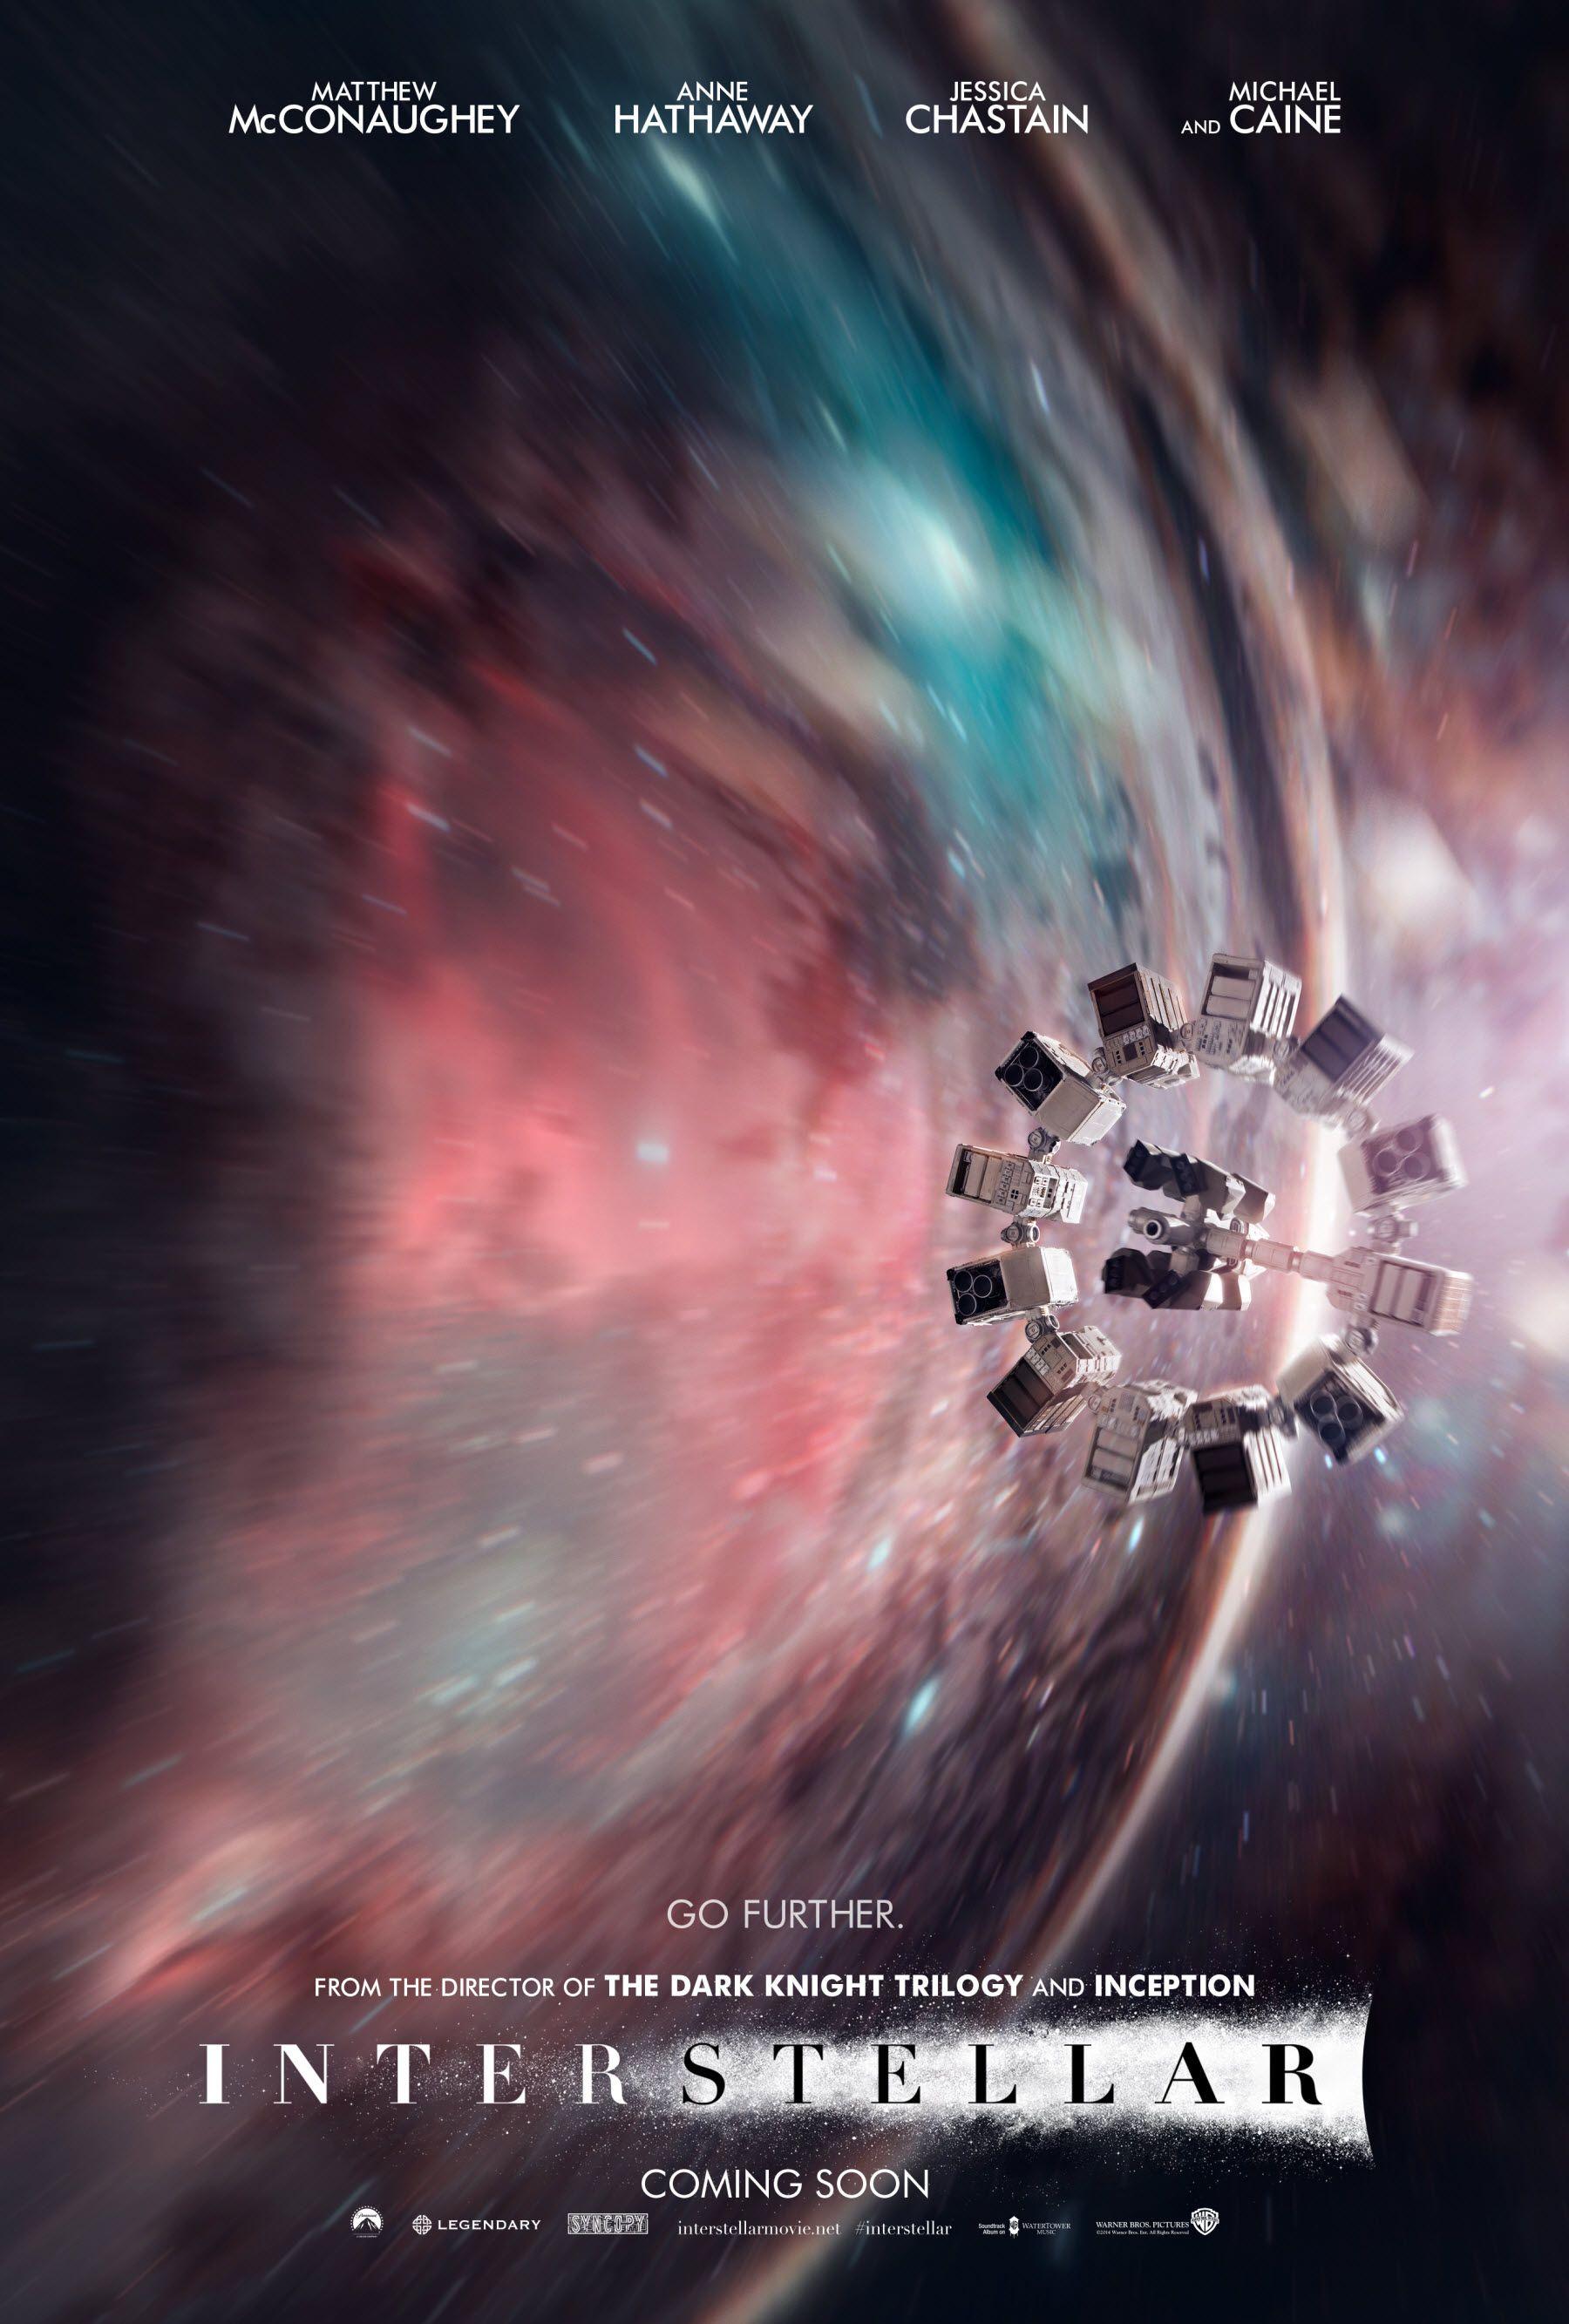 Christopher Nolan S Interstellar Imax Poster Interstellar Movie Poster Interstellar Movie Interstellar Posters